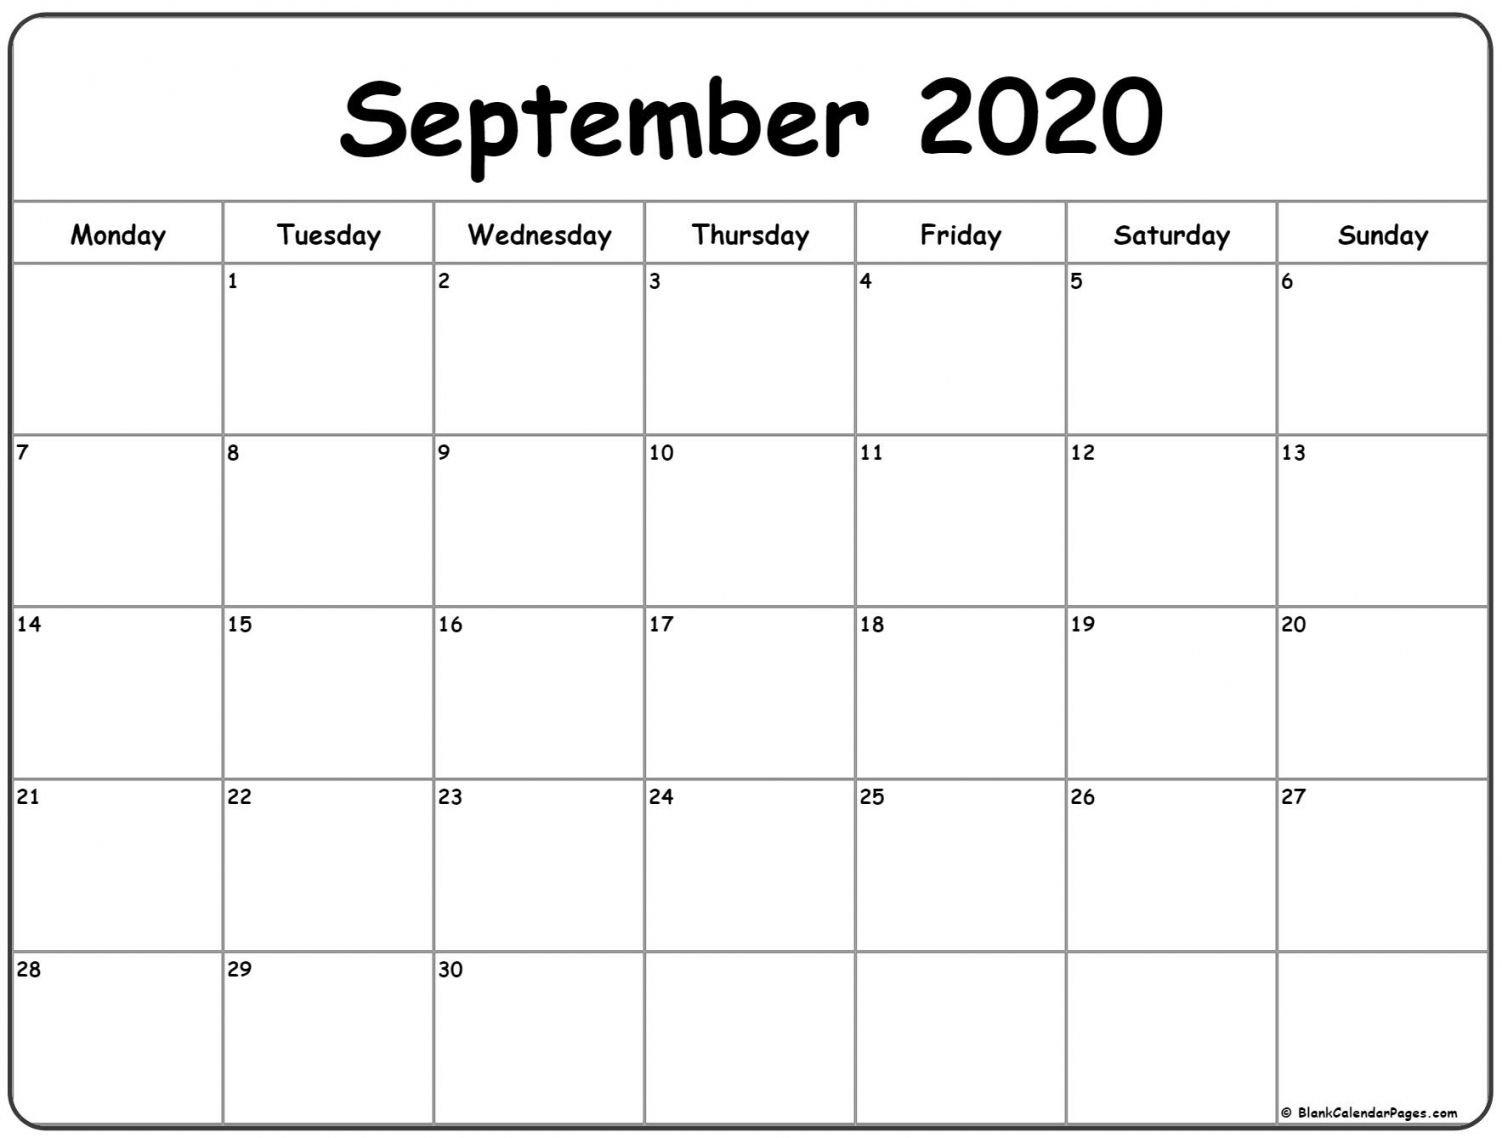 September 2020 Calendar | October Calendar, Calendar Blank Sunday Through Saturday Calendar